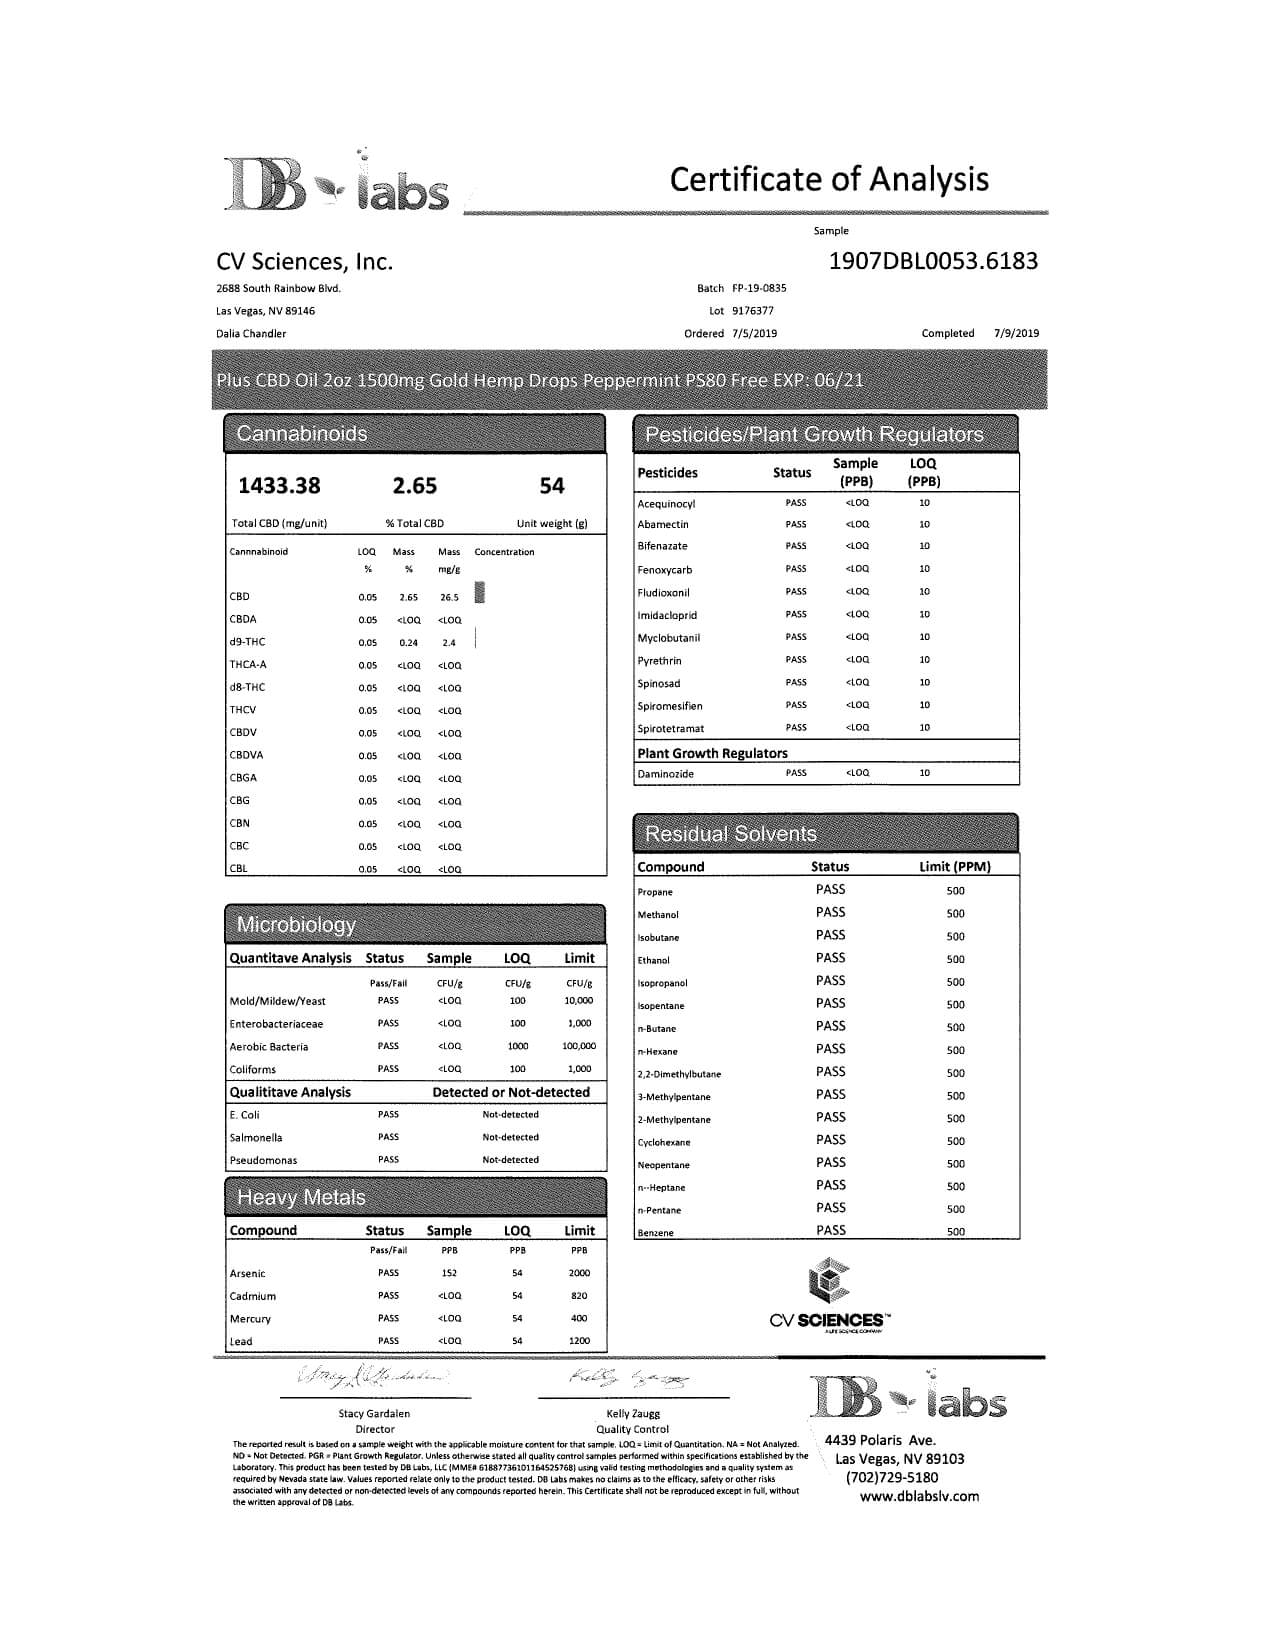 PlusCBD Oil CBD Tincture Gold Drops Peppermint 1500mg Lab Report